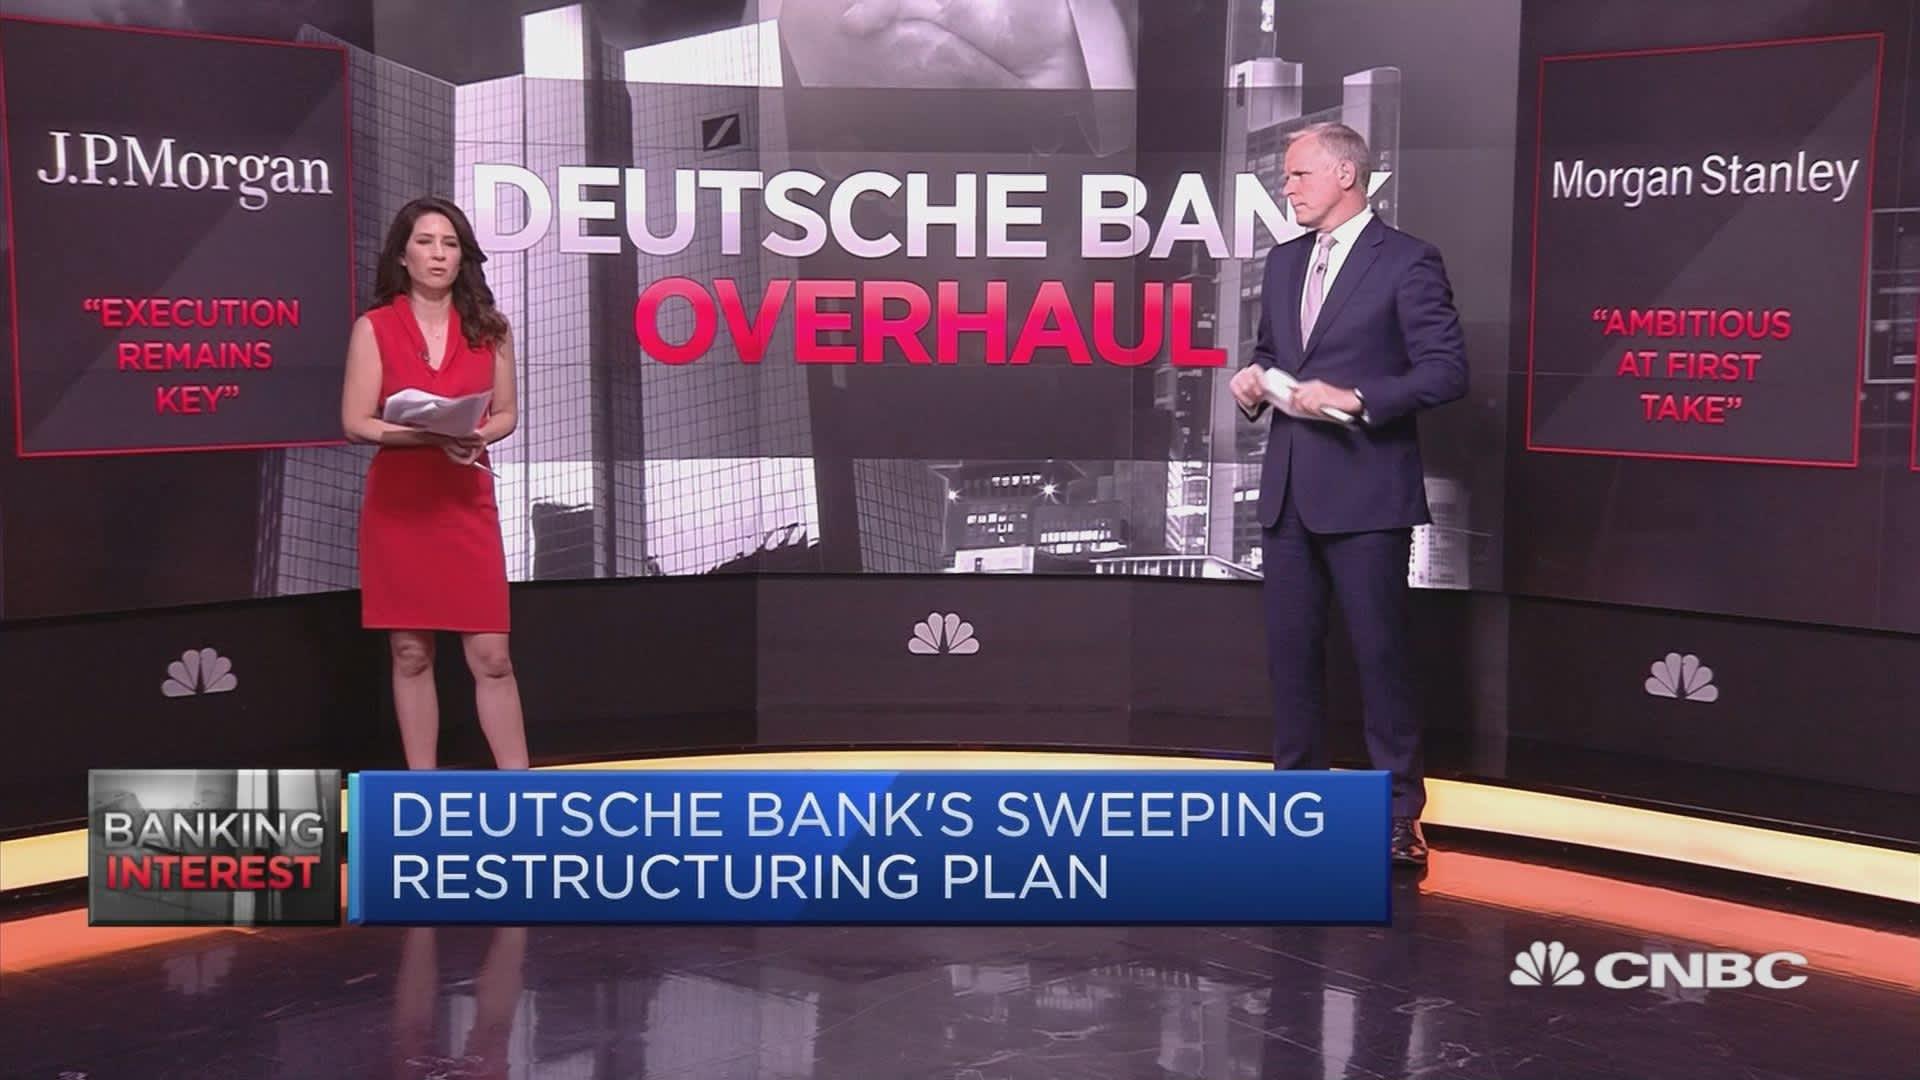 Wall Street on Deutsche Bank's $8 3 billion overhaul